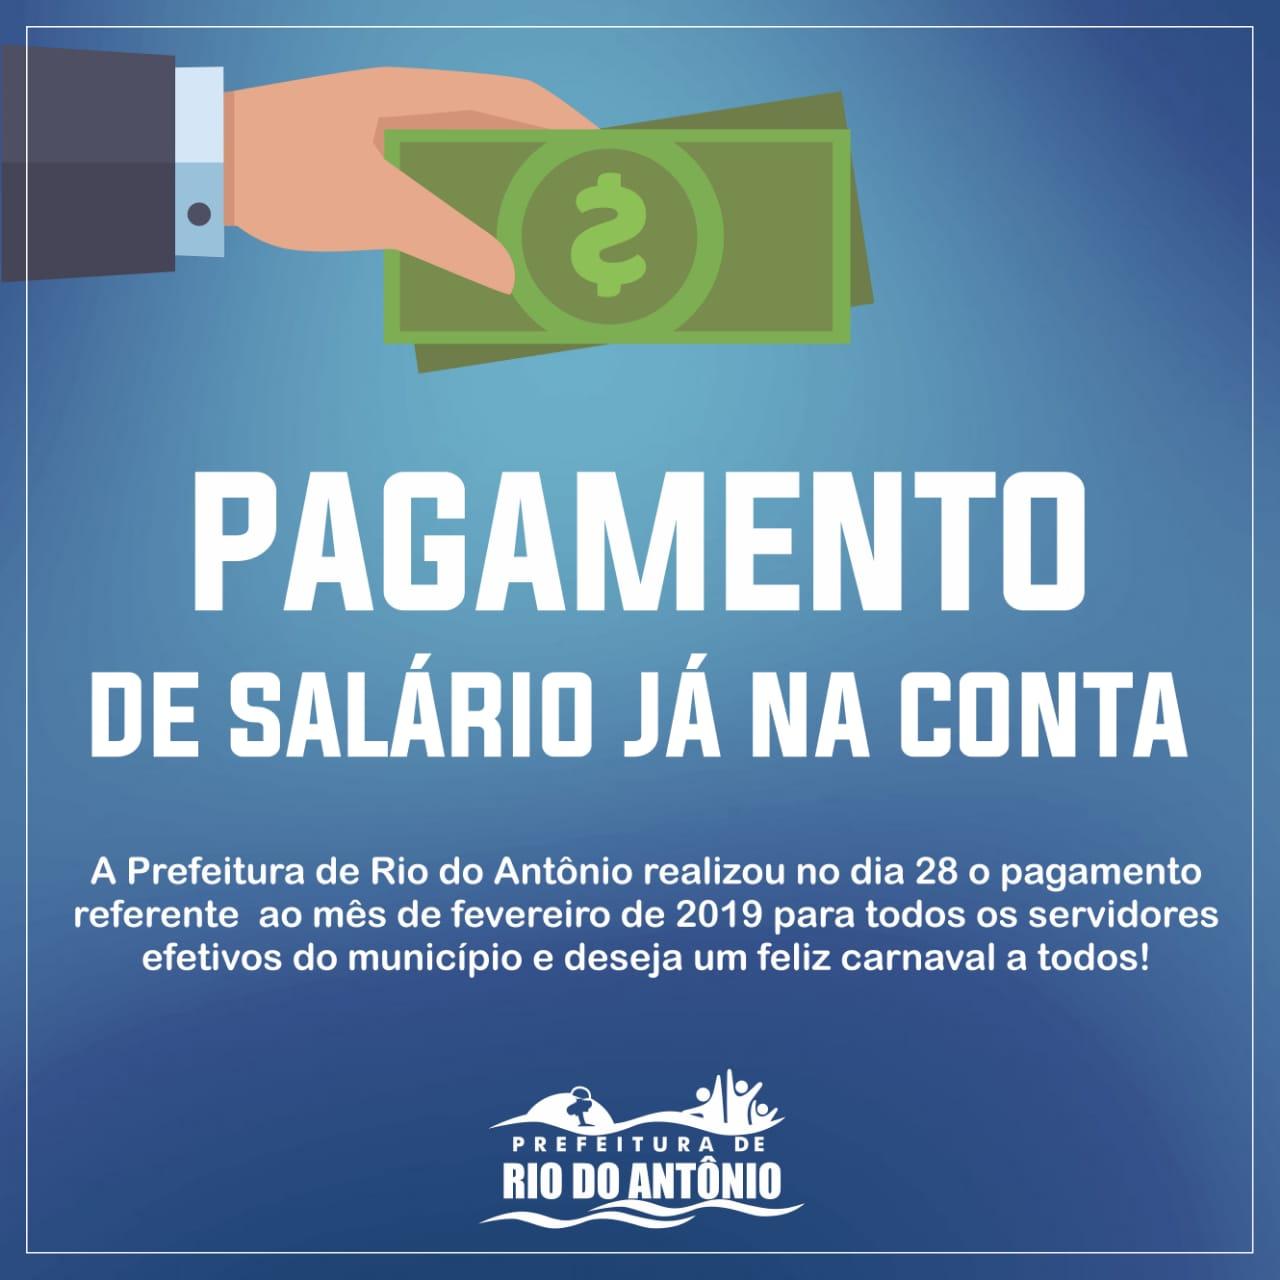 Prefeitura de Rio do Antônio  antecipa pagamento de servidores devido ao período carnavalesco